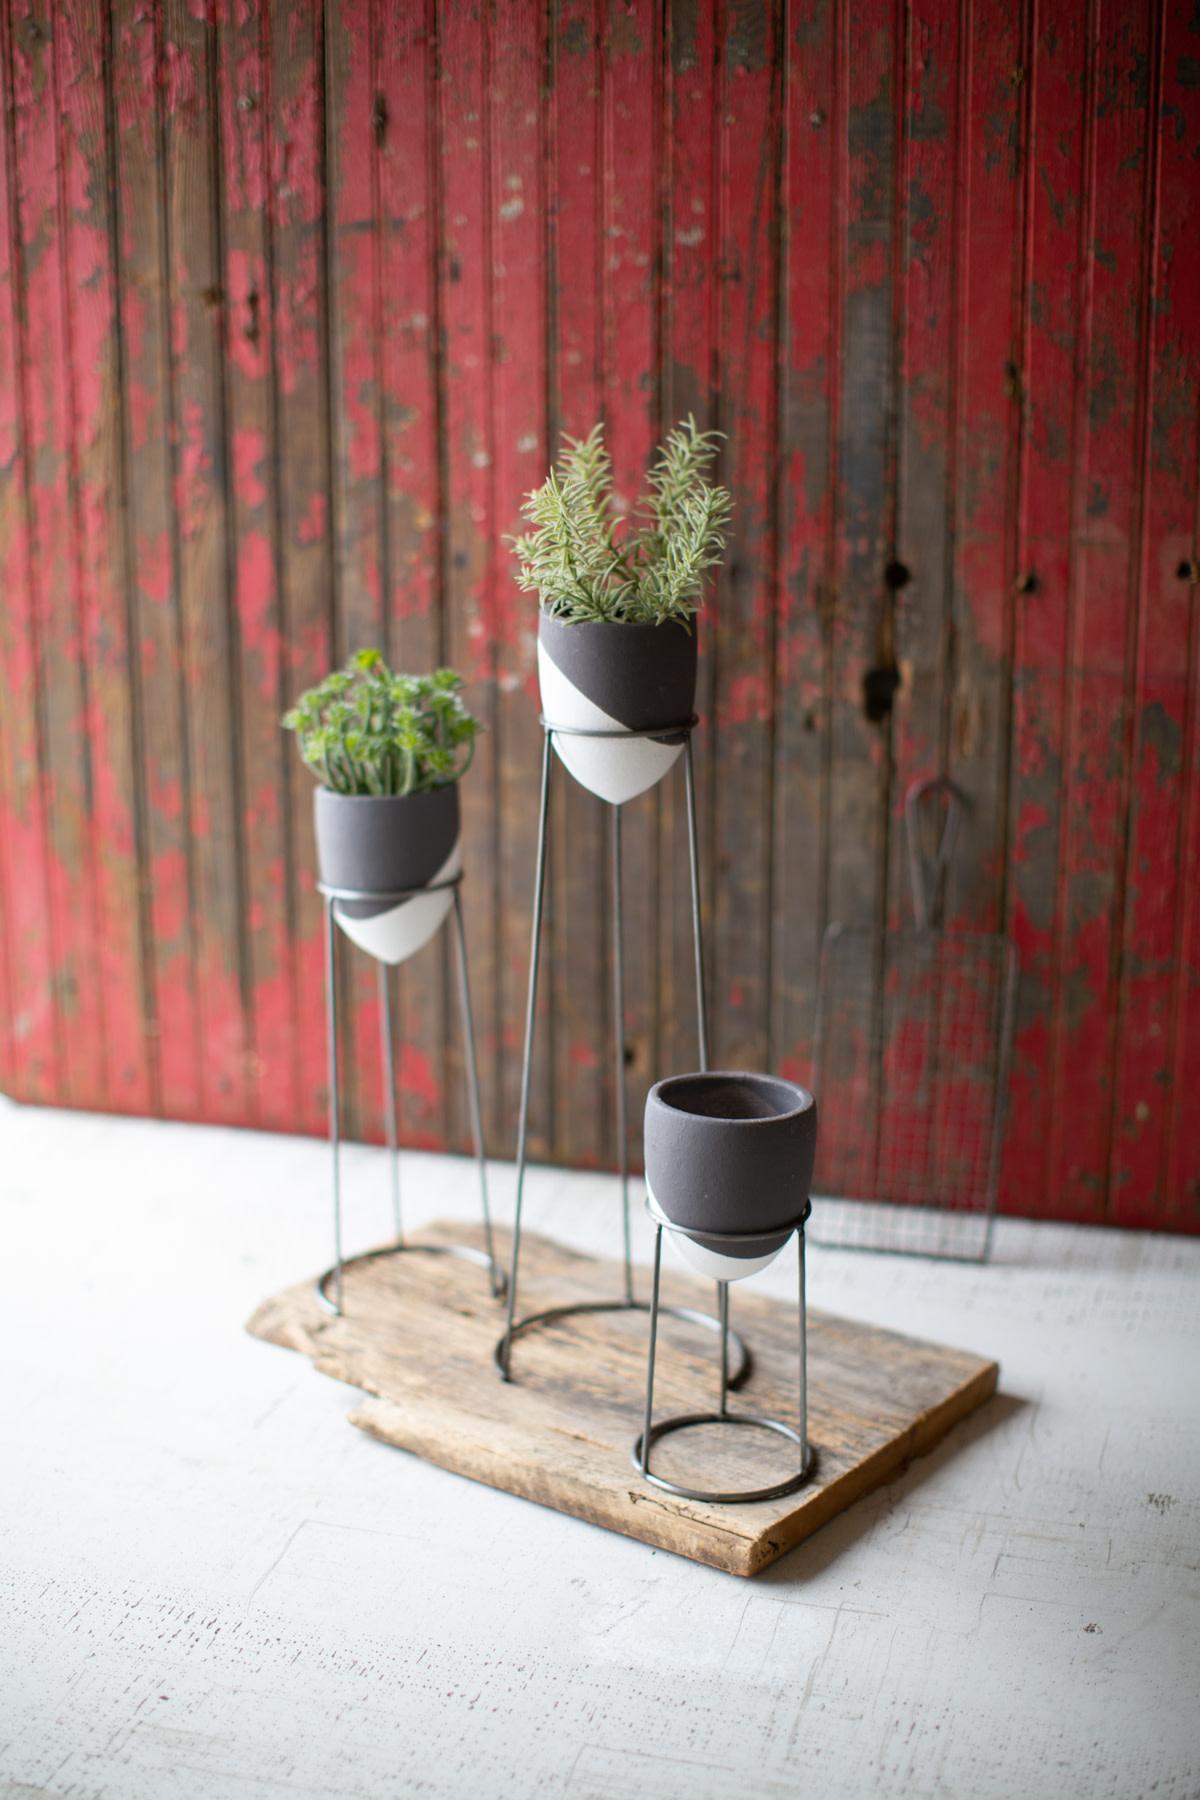 Kalalou Grey and White Wire Planter